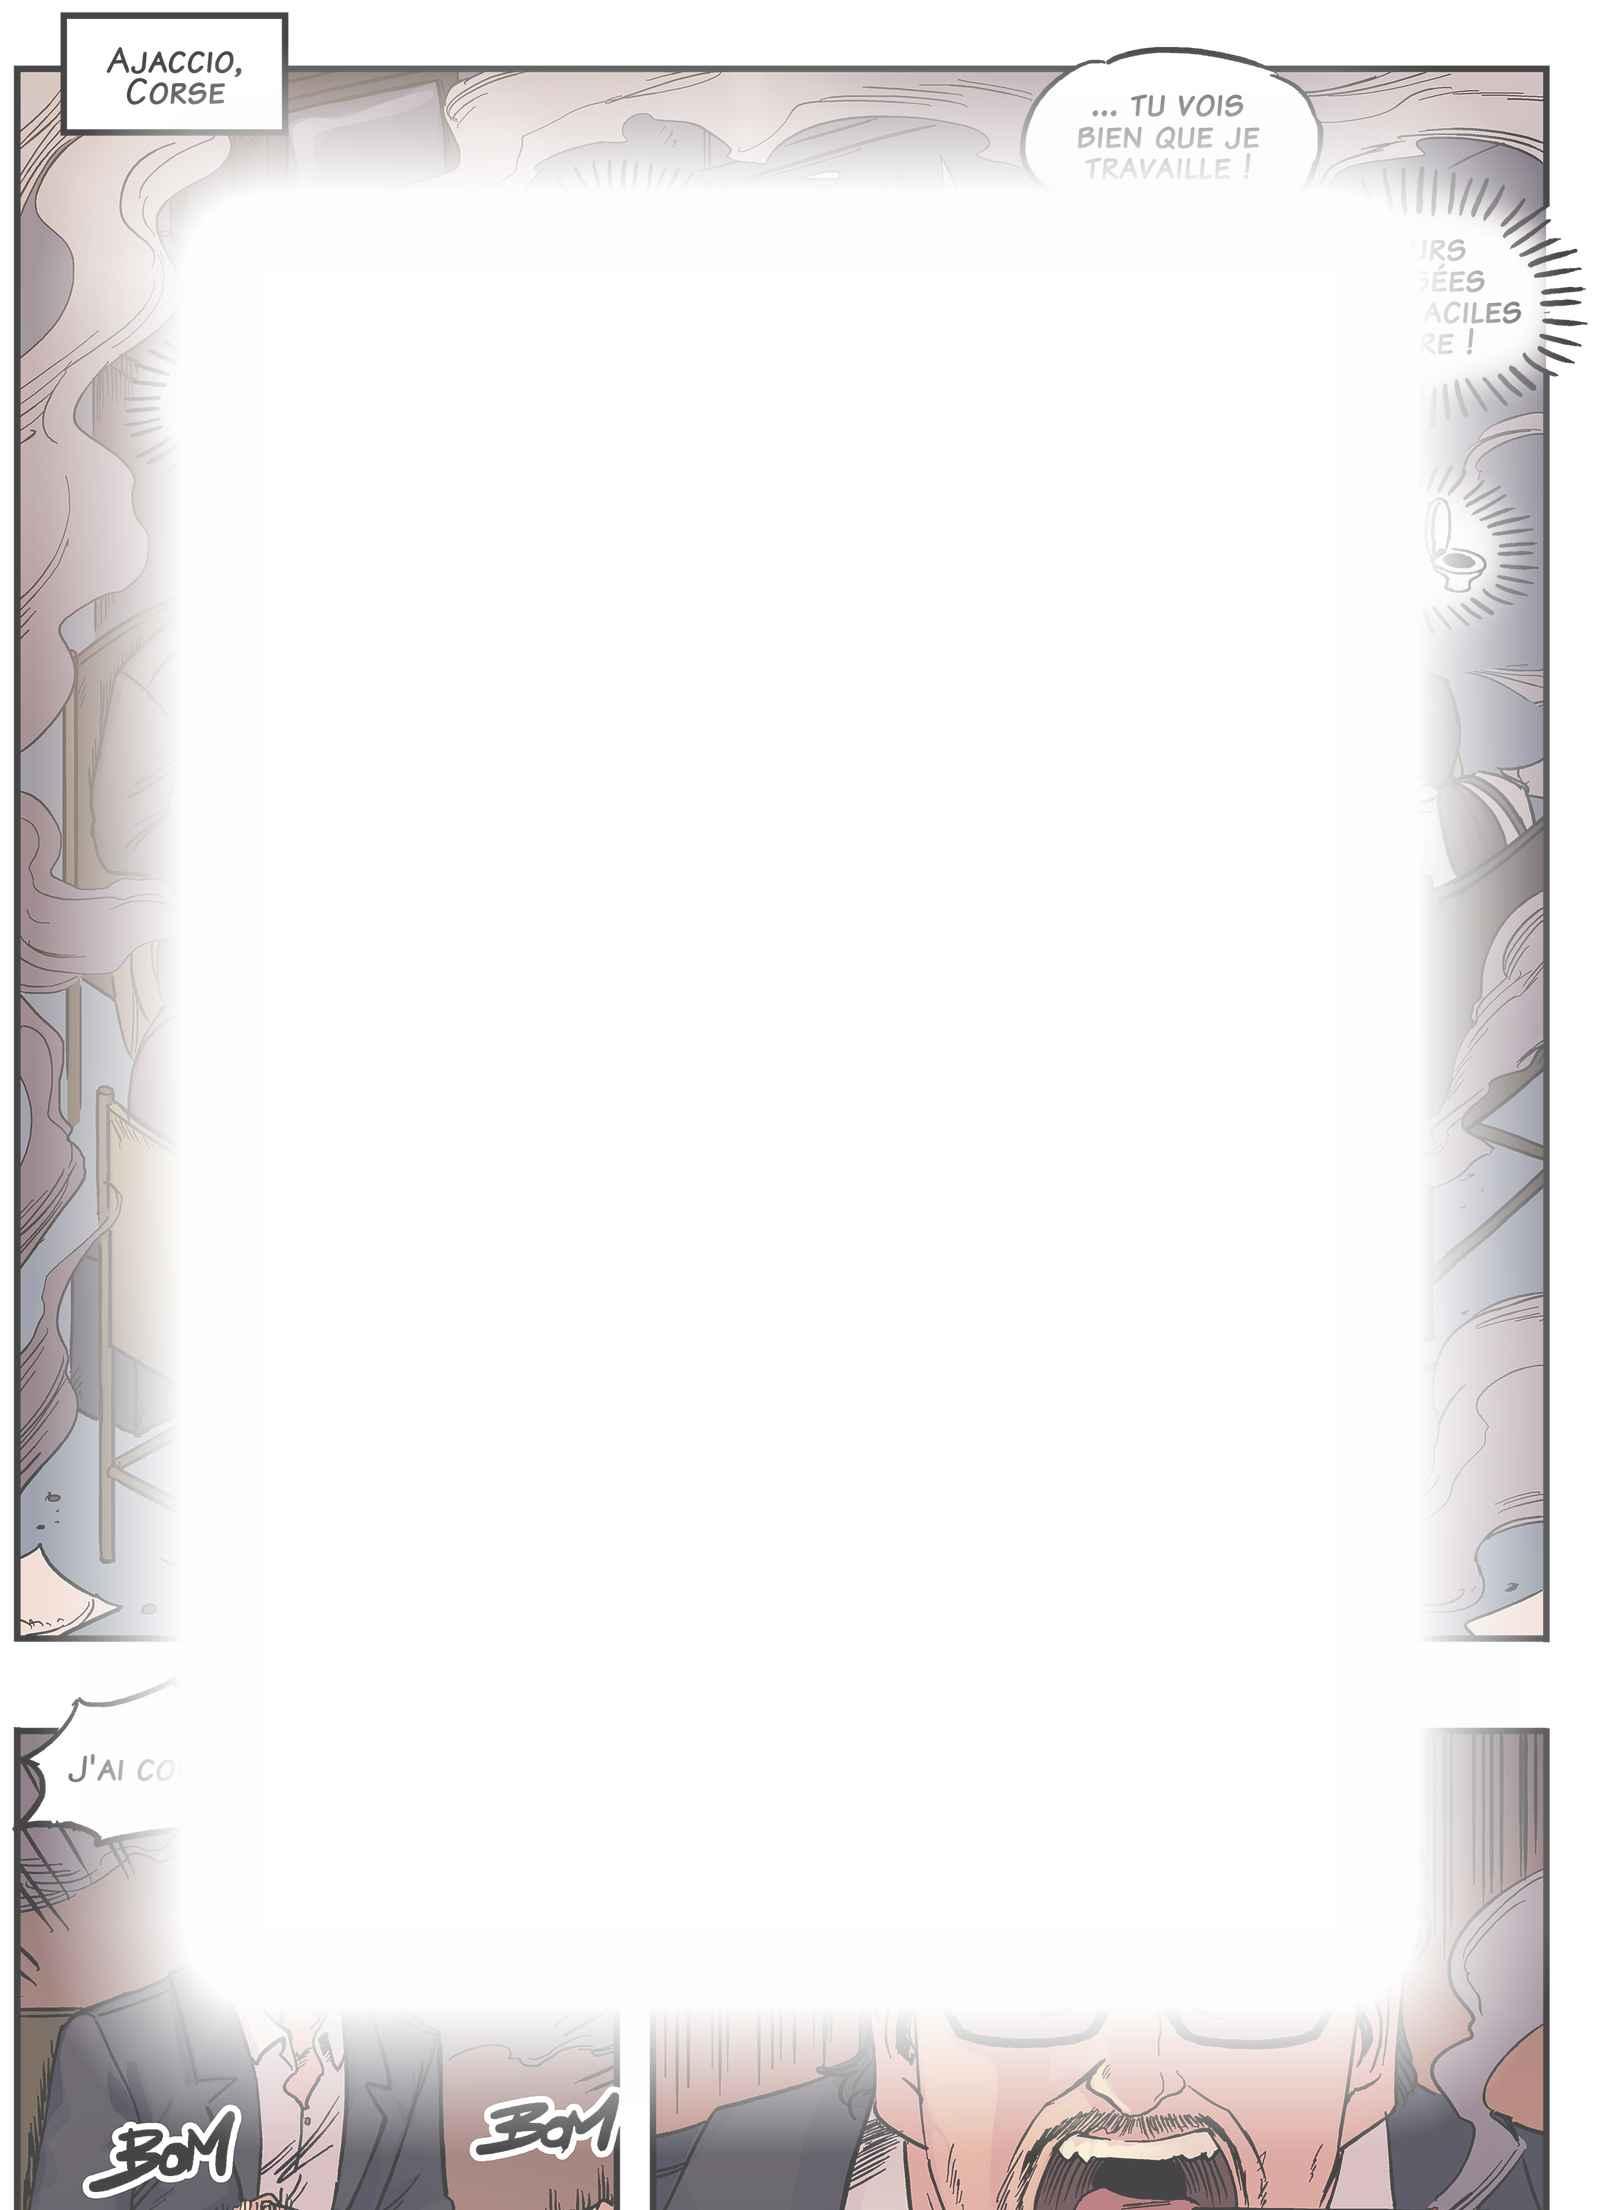 Amilova : Chapitre 5 page 5